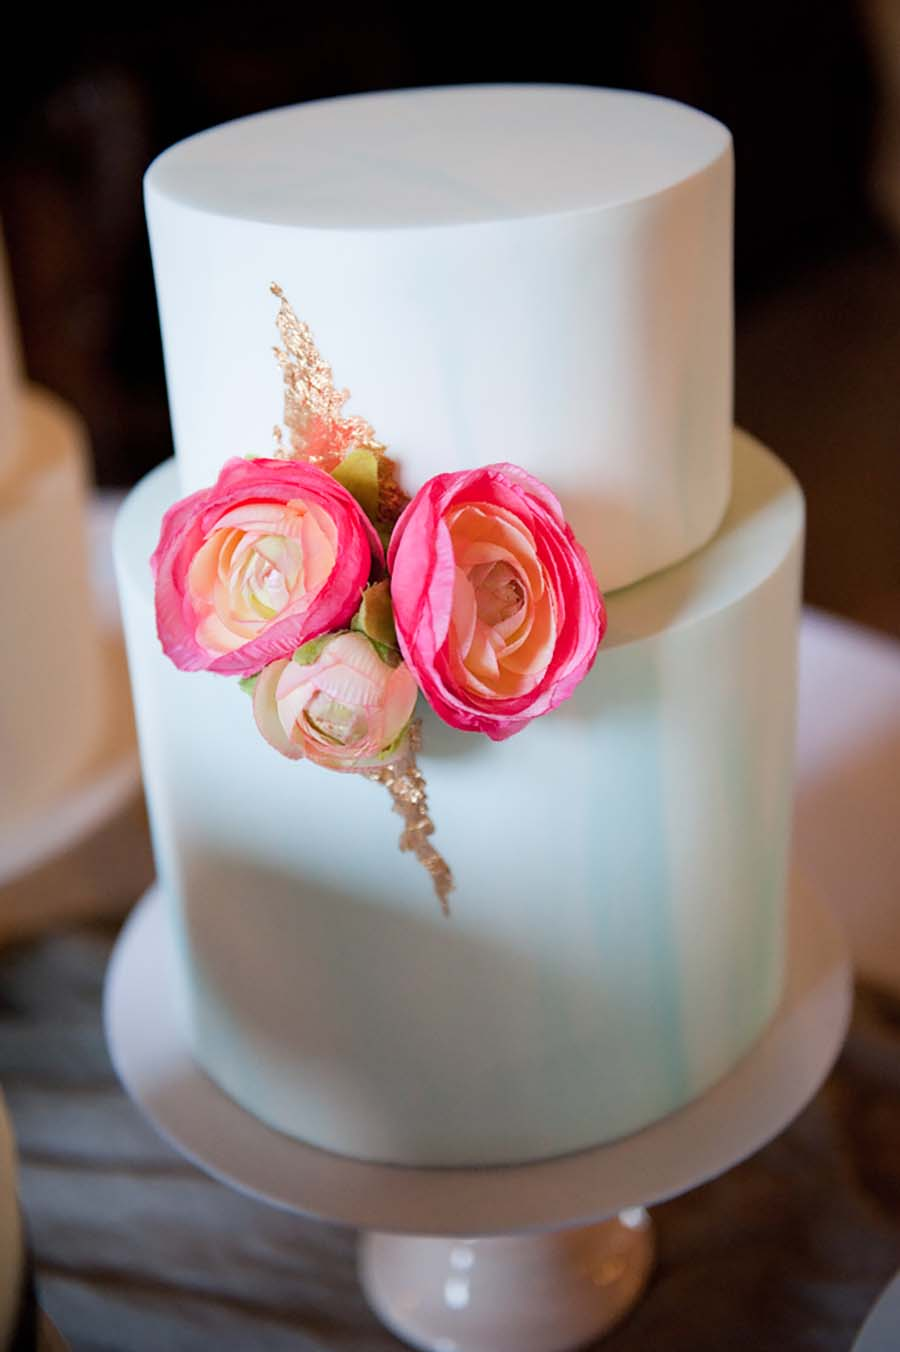 Buckinghams-at-belvoir-castle-wedding-fair-rachael-connerton-photography-105